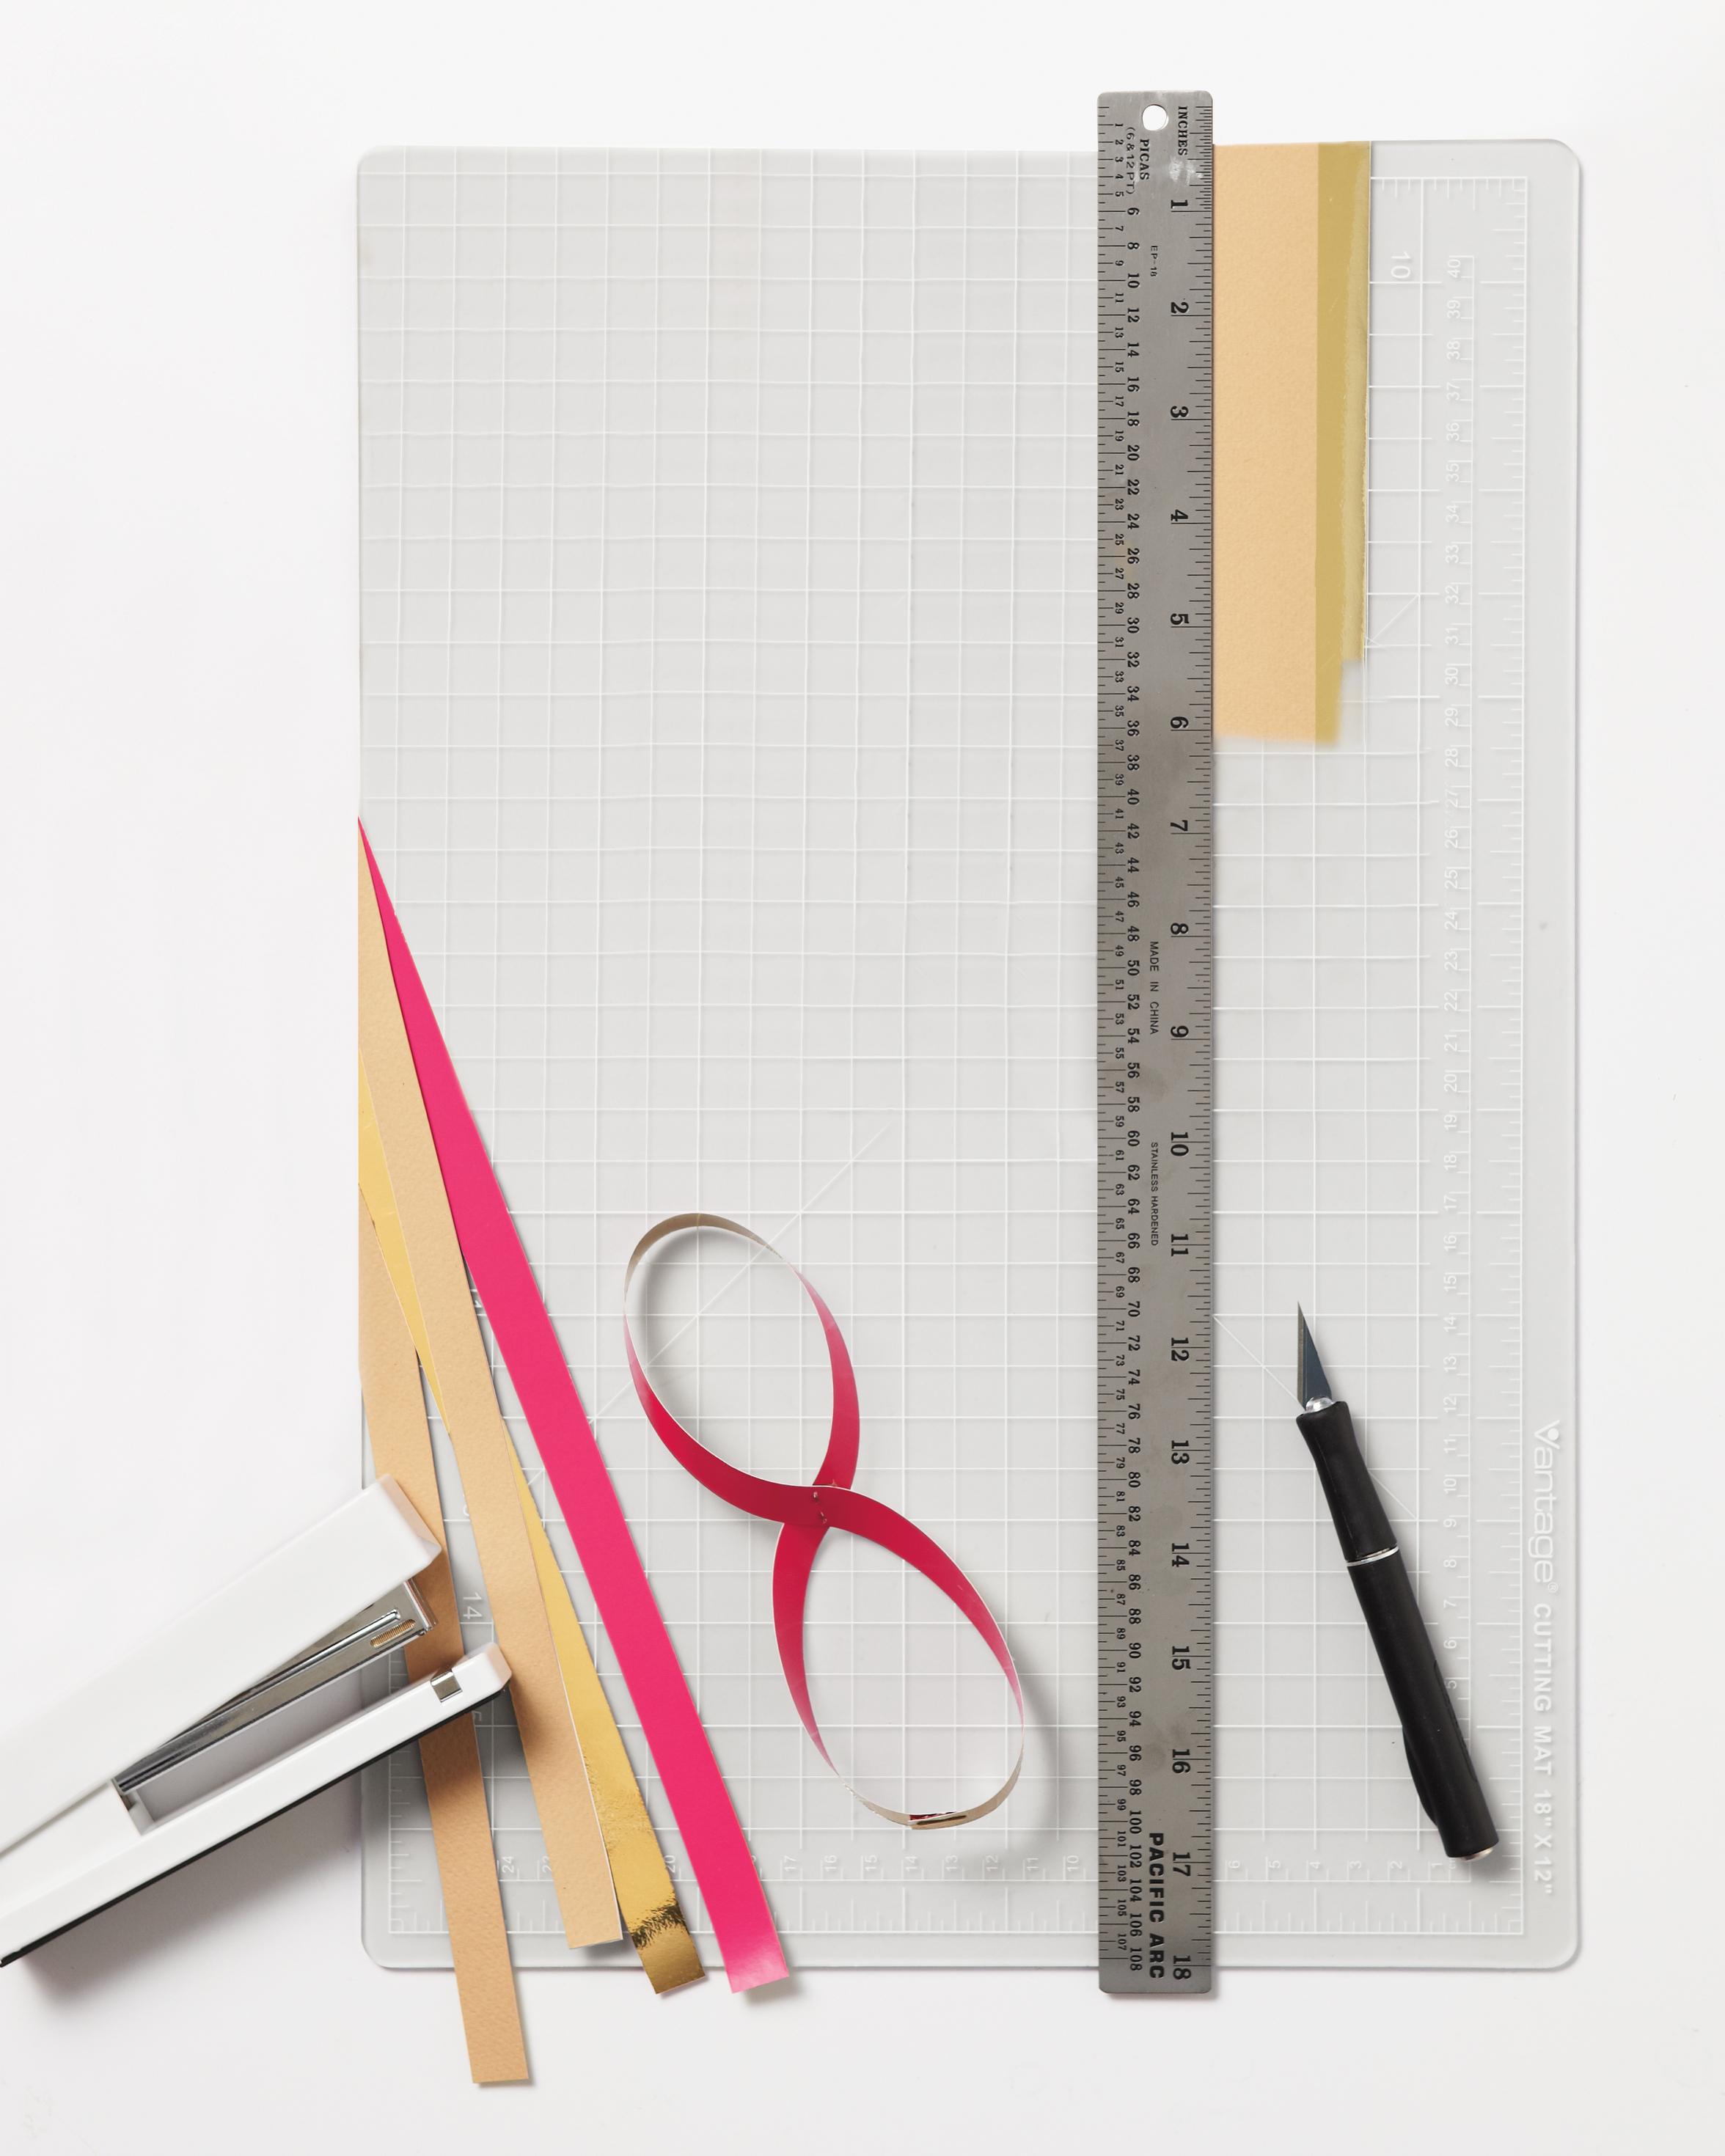 diy-tools-of-the-trade-figure-eights-096-comp-mwd110941.jpg